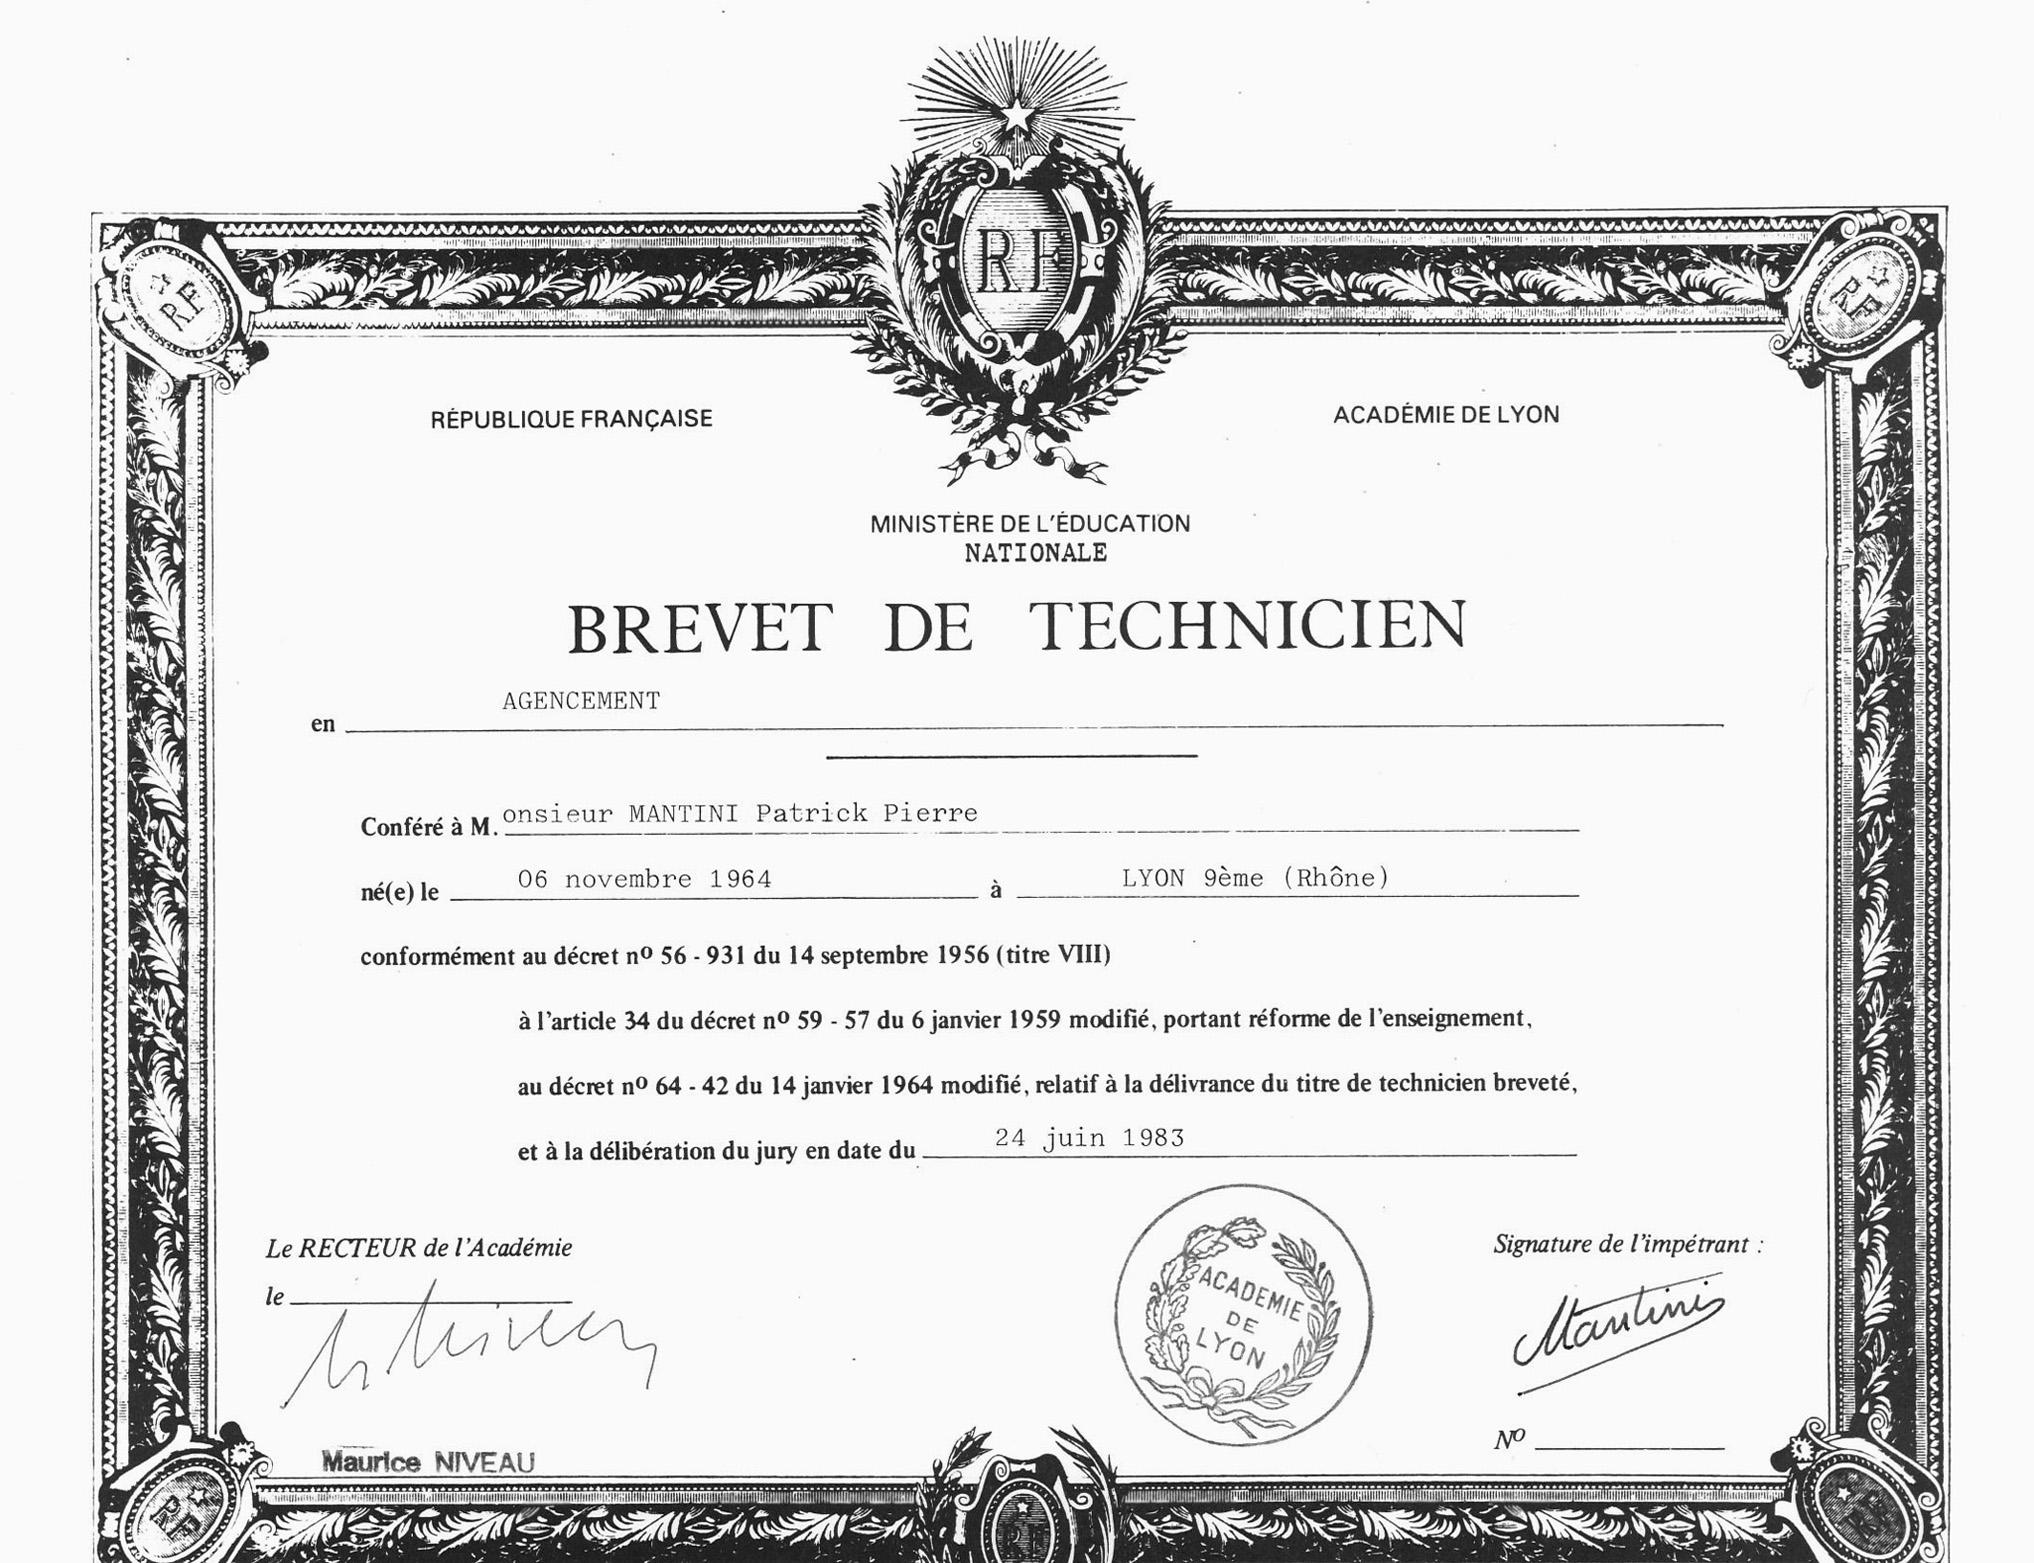 BREVET DE TECHNICIEN AGENCEMENT